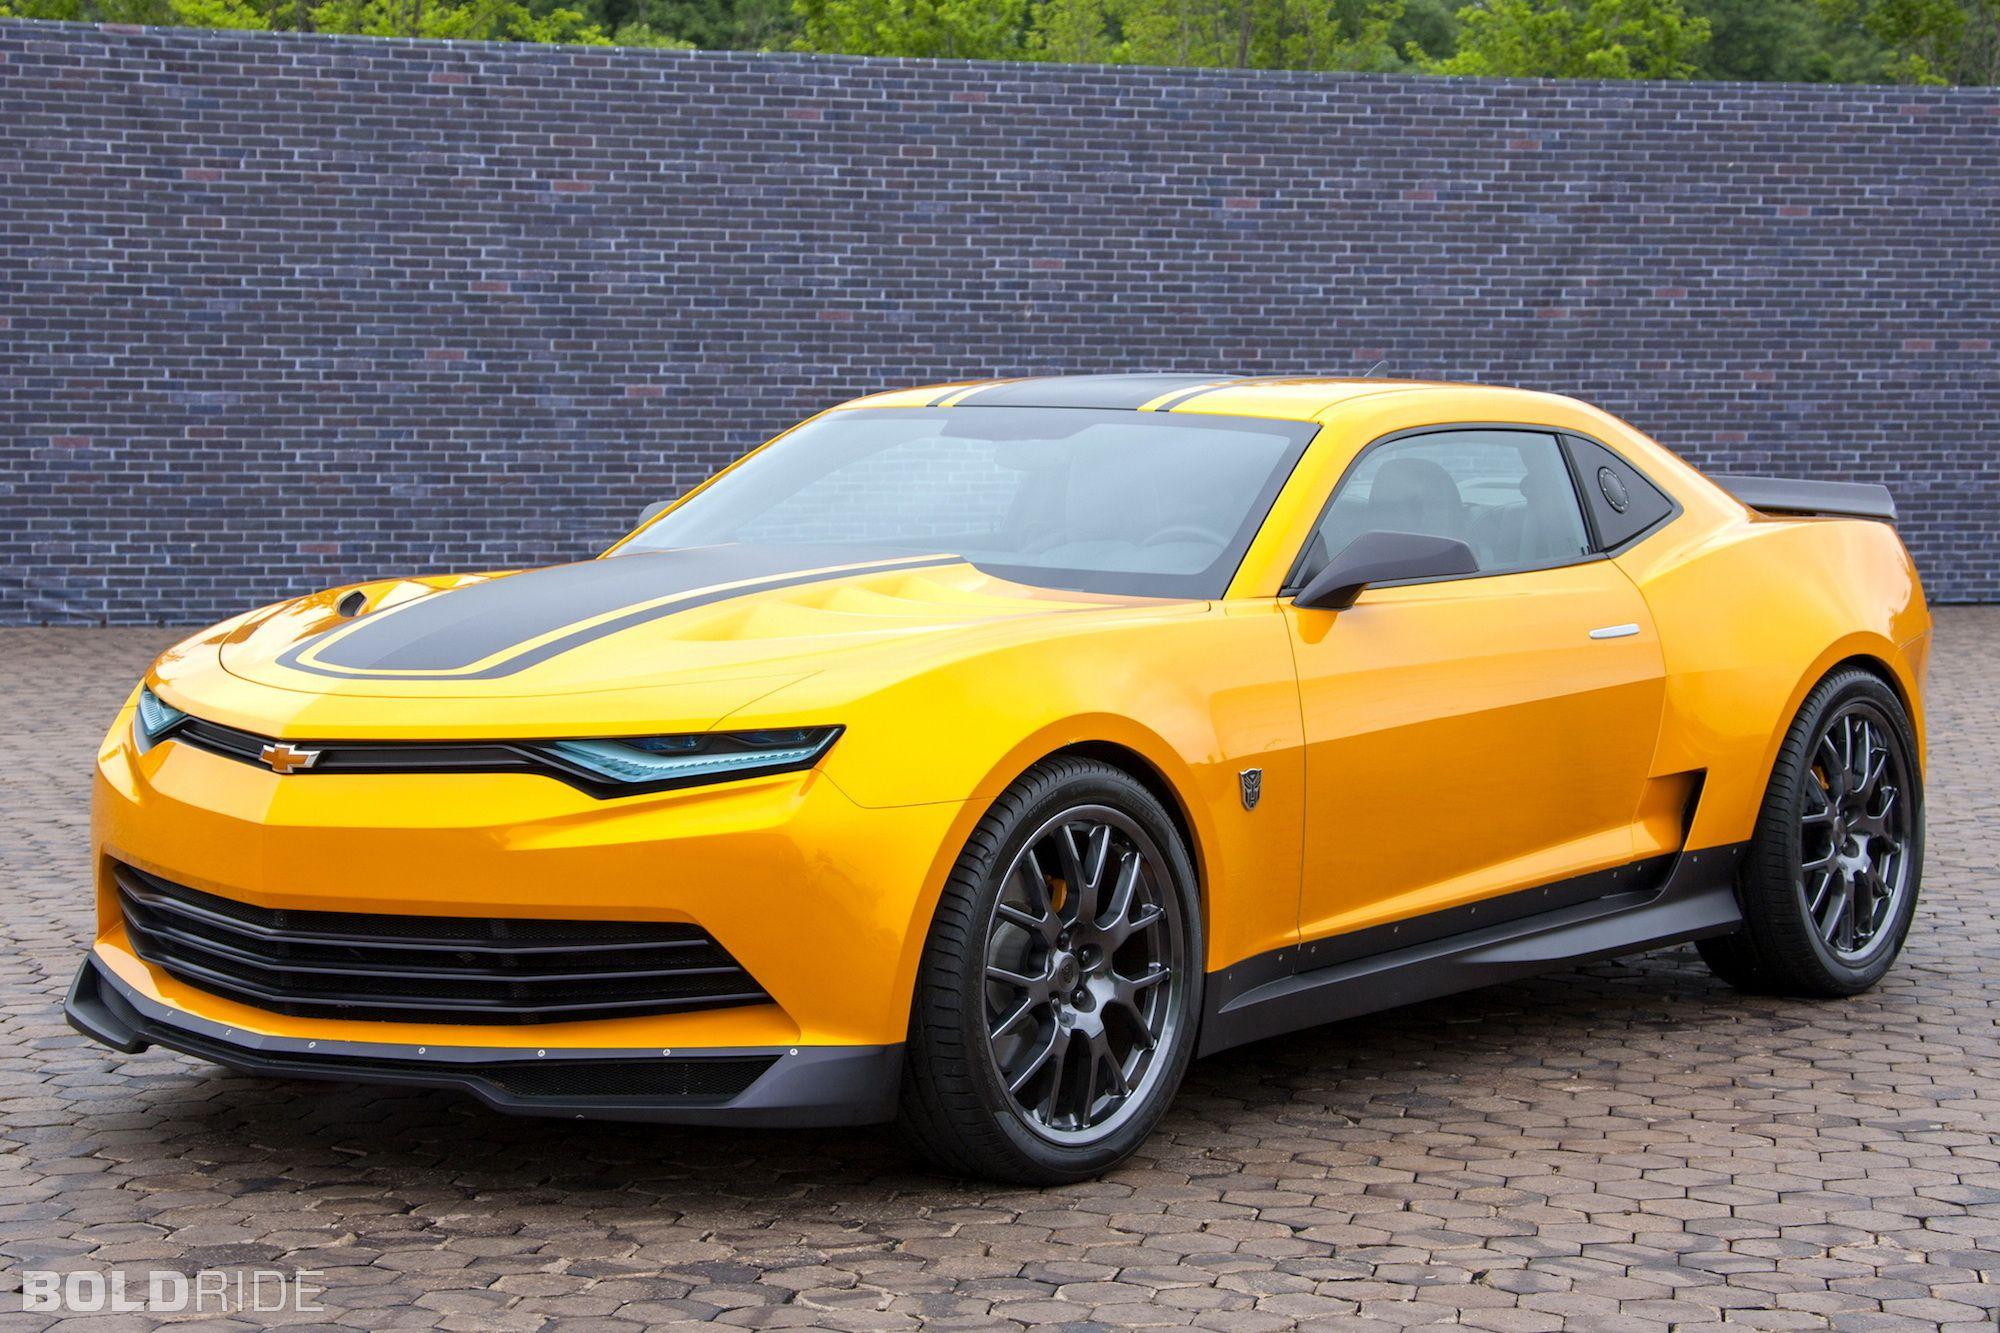 Chevrolet Camaro Bumblebee Concept 2000x1333 Jul 03 2014 16 23 20